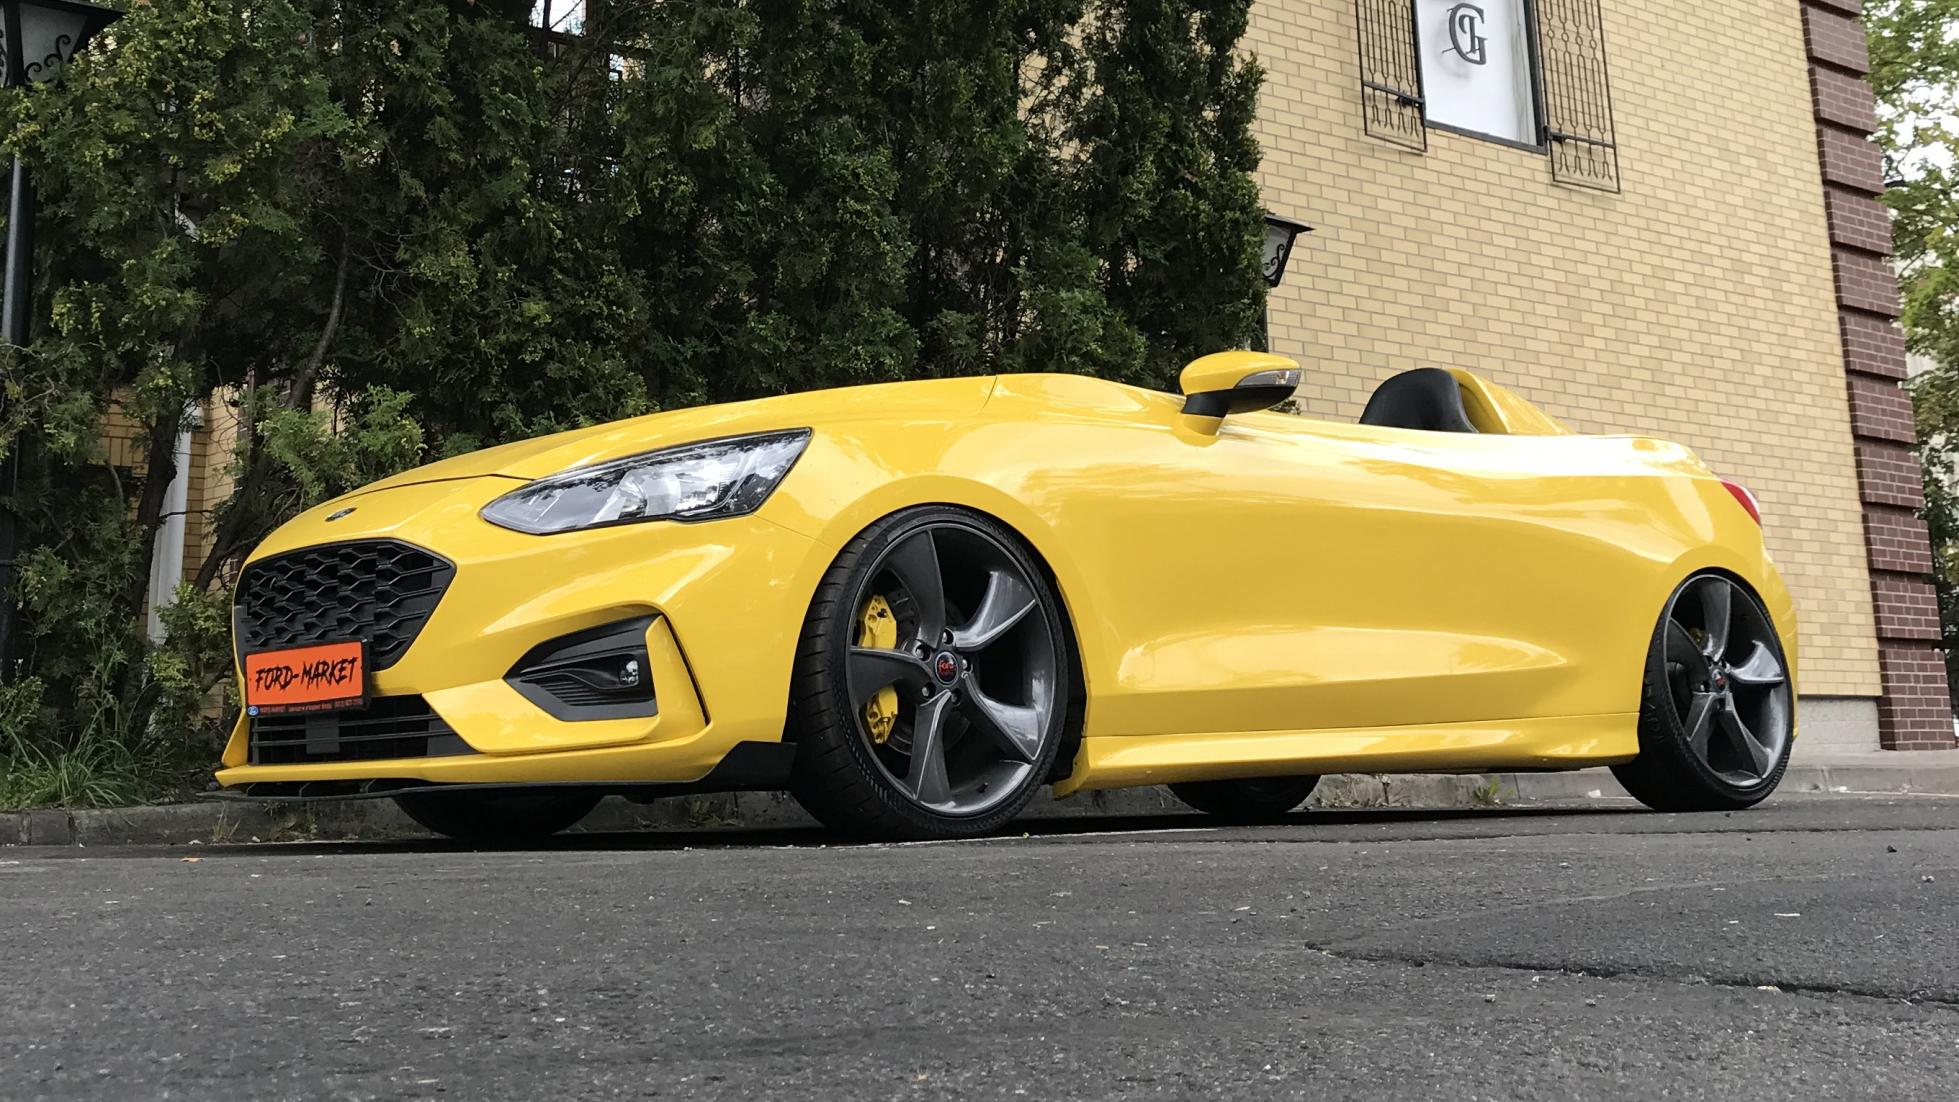 Cette Ford Focus Speedster est la McLaren Elva du pauvre - Galerie